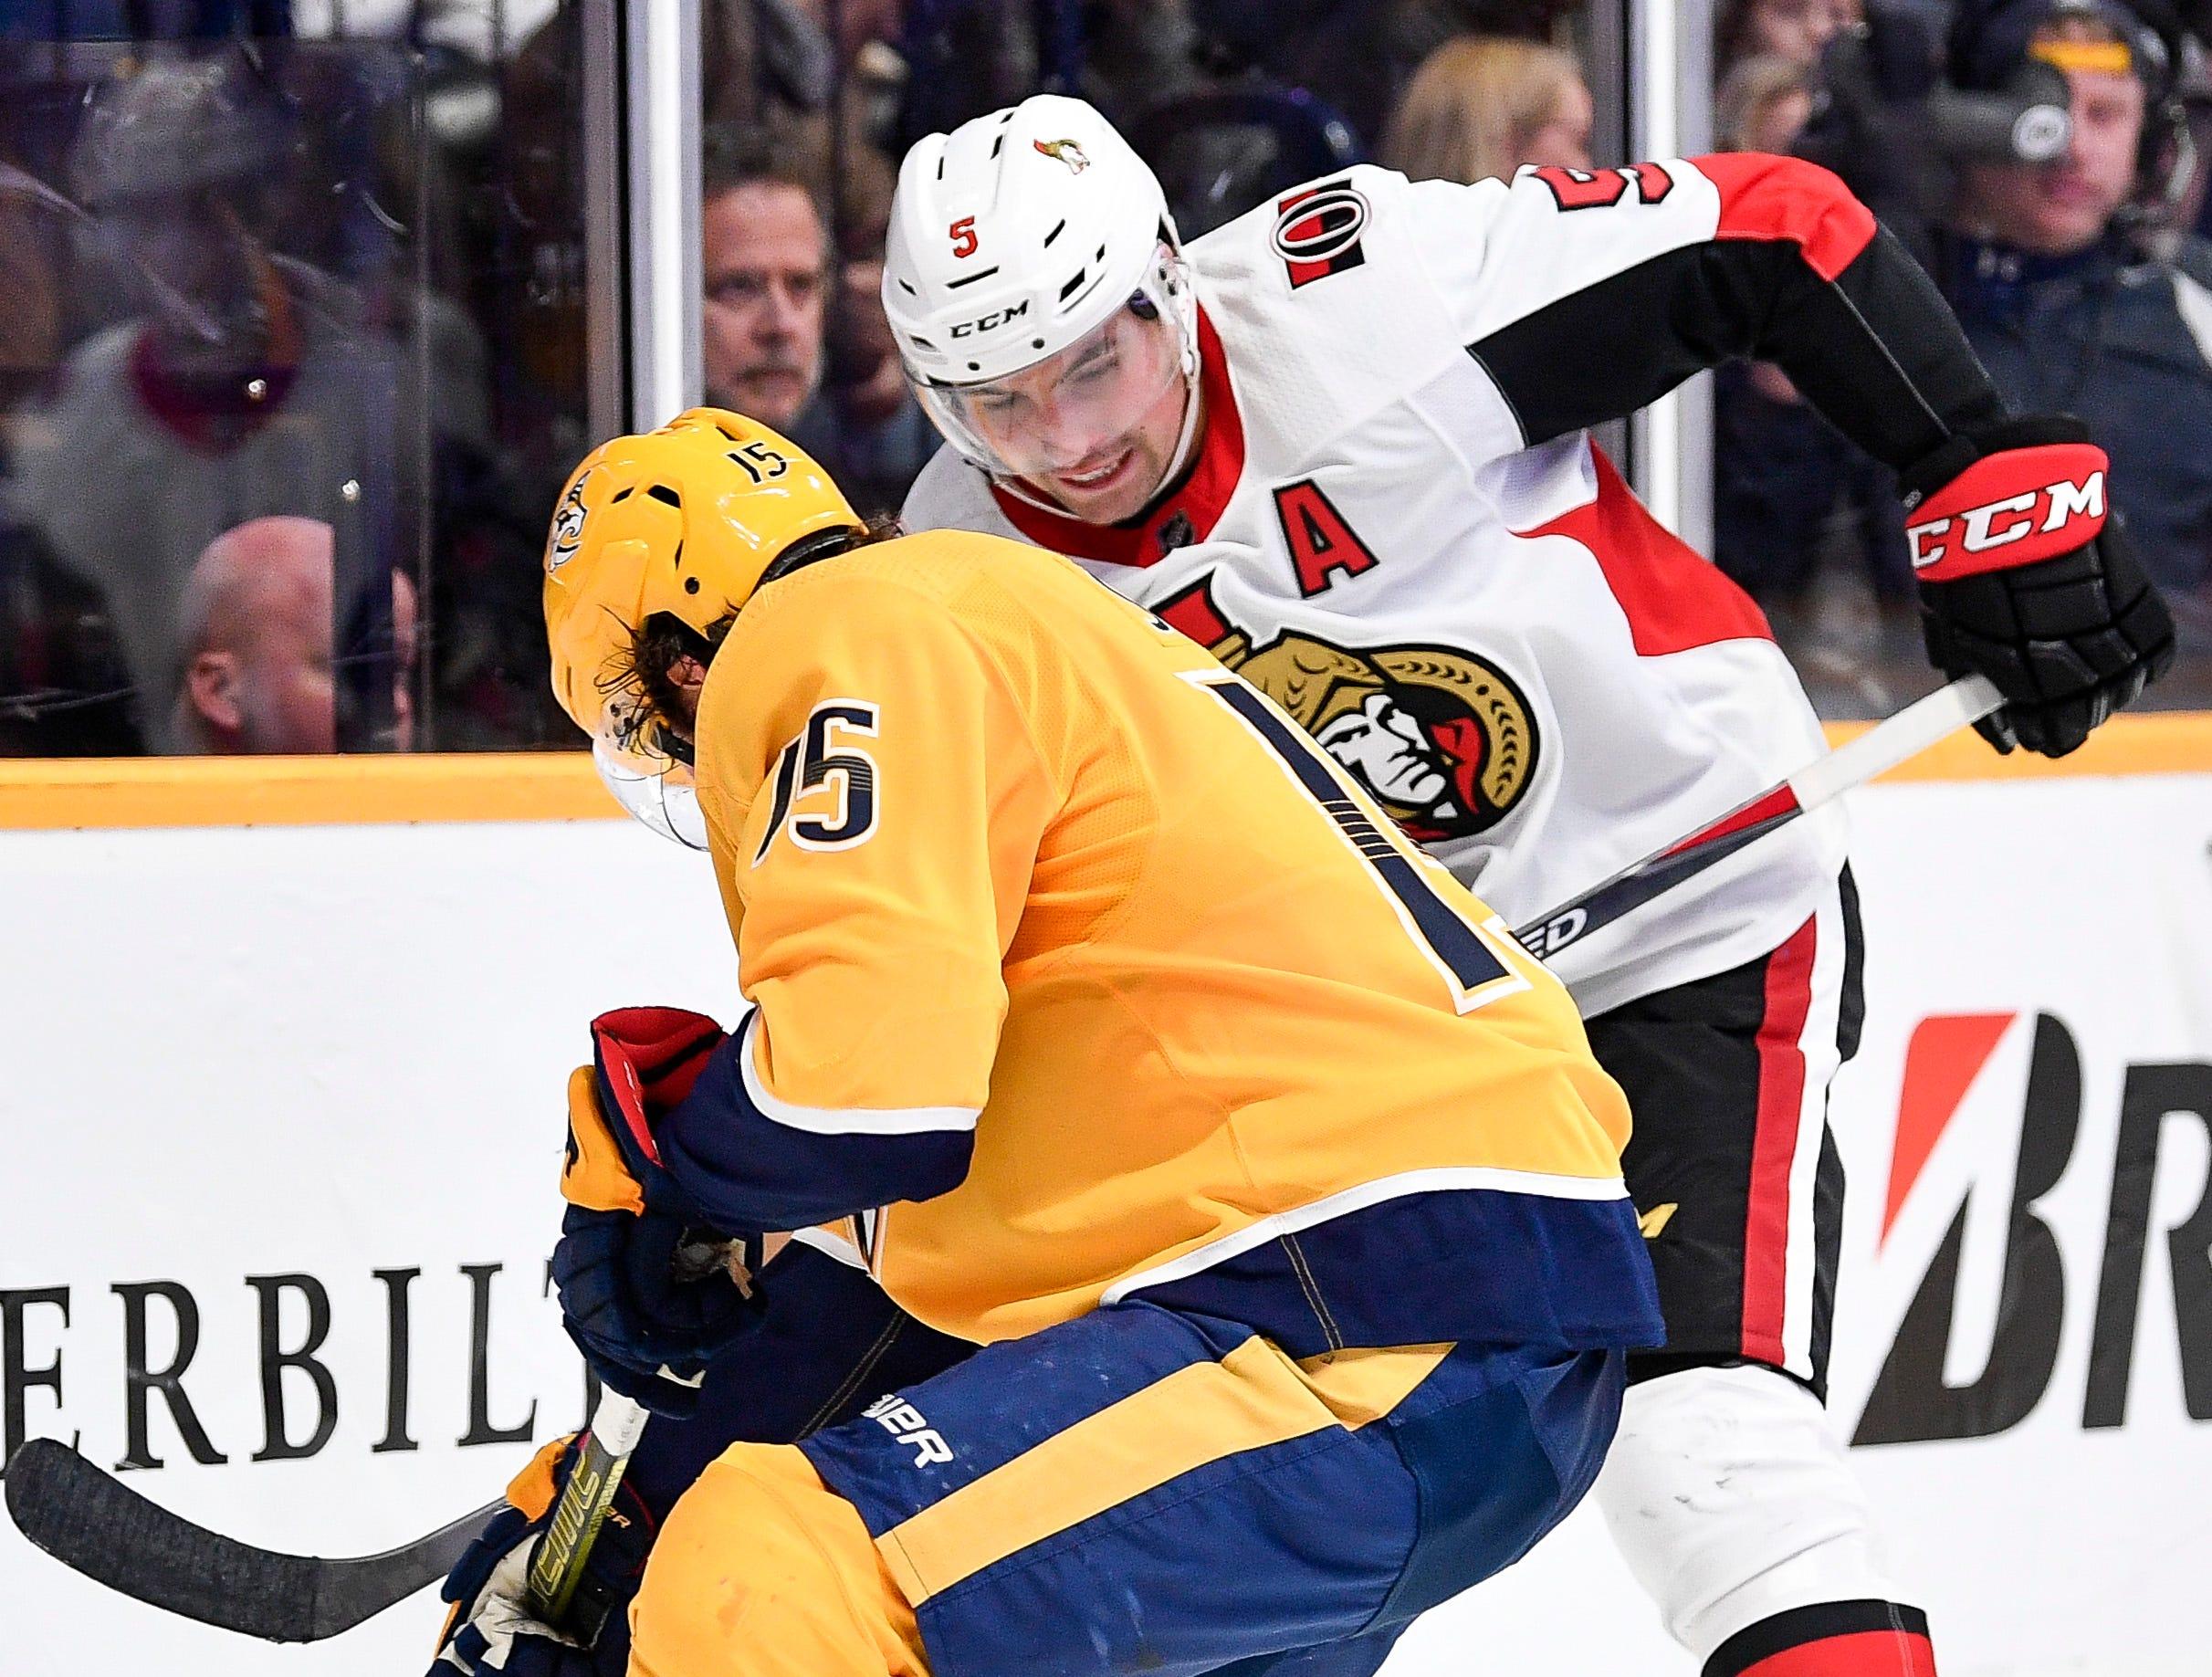 Ottawa Senators defenseman Cody Ceci (5) passes past Nashville Predators right wing Craig Smith (15) during the third period at Bridgestone Arena in Nashville, Tenn., Tuesday, Dec. 11, 2018.